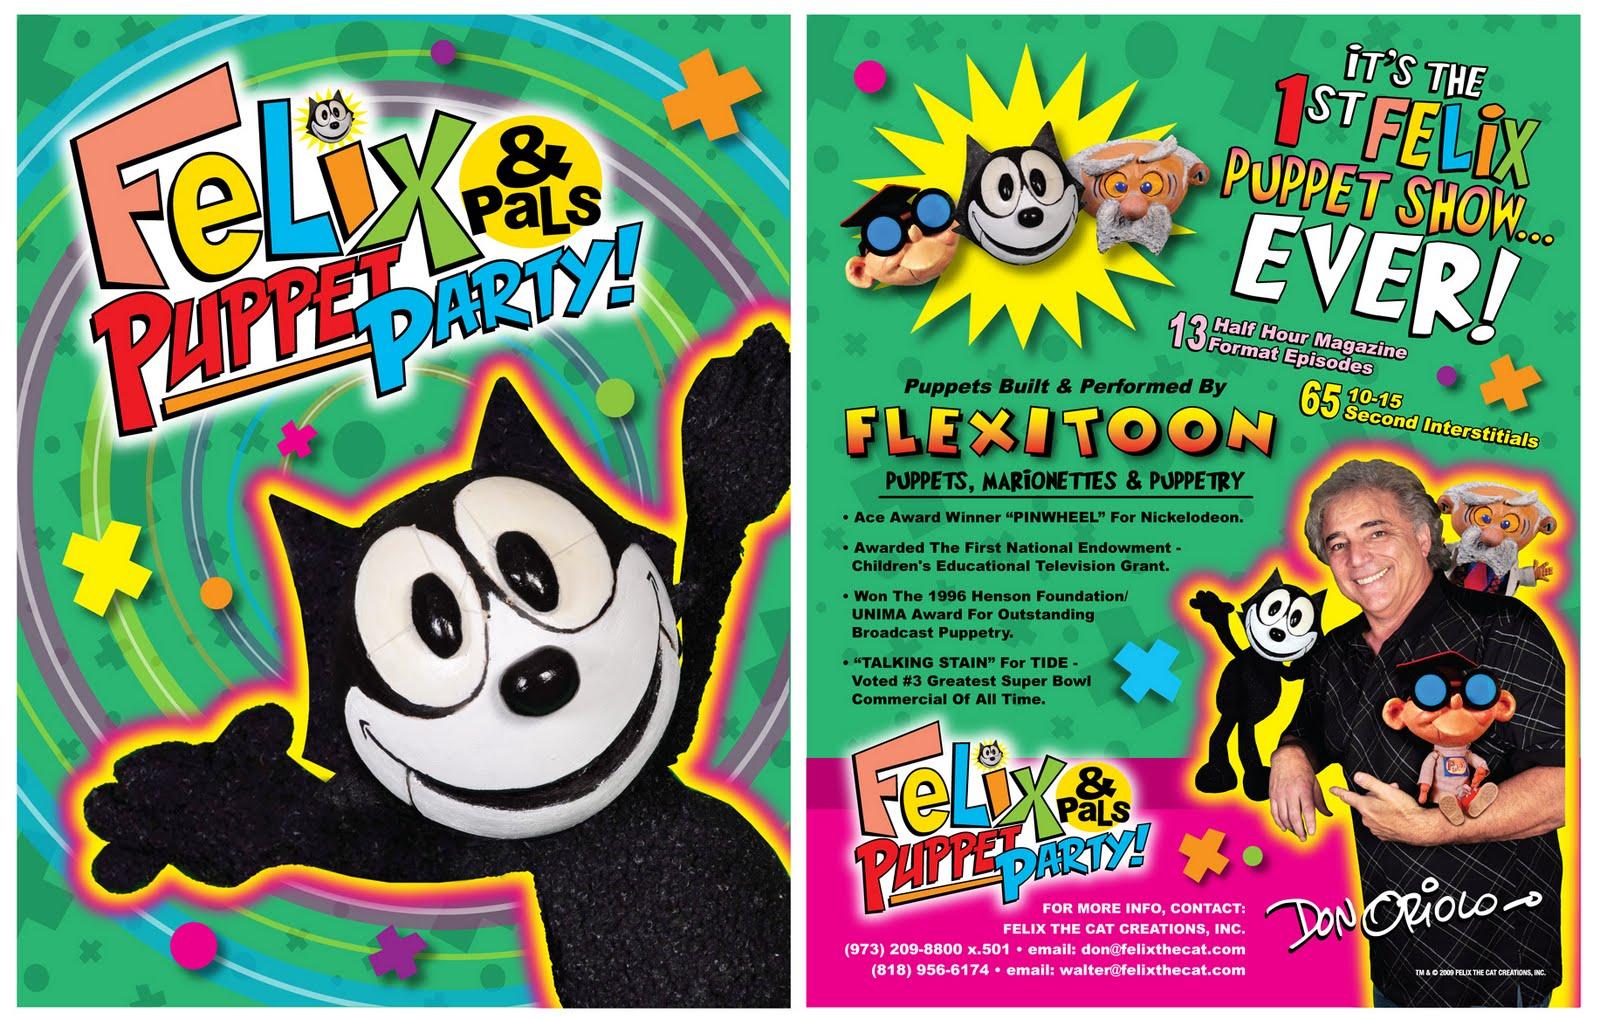 Felix & Pals Puppet Party! (Cancelled 2009 TV Series)